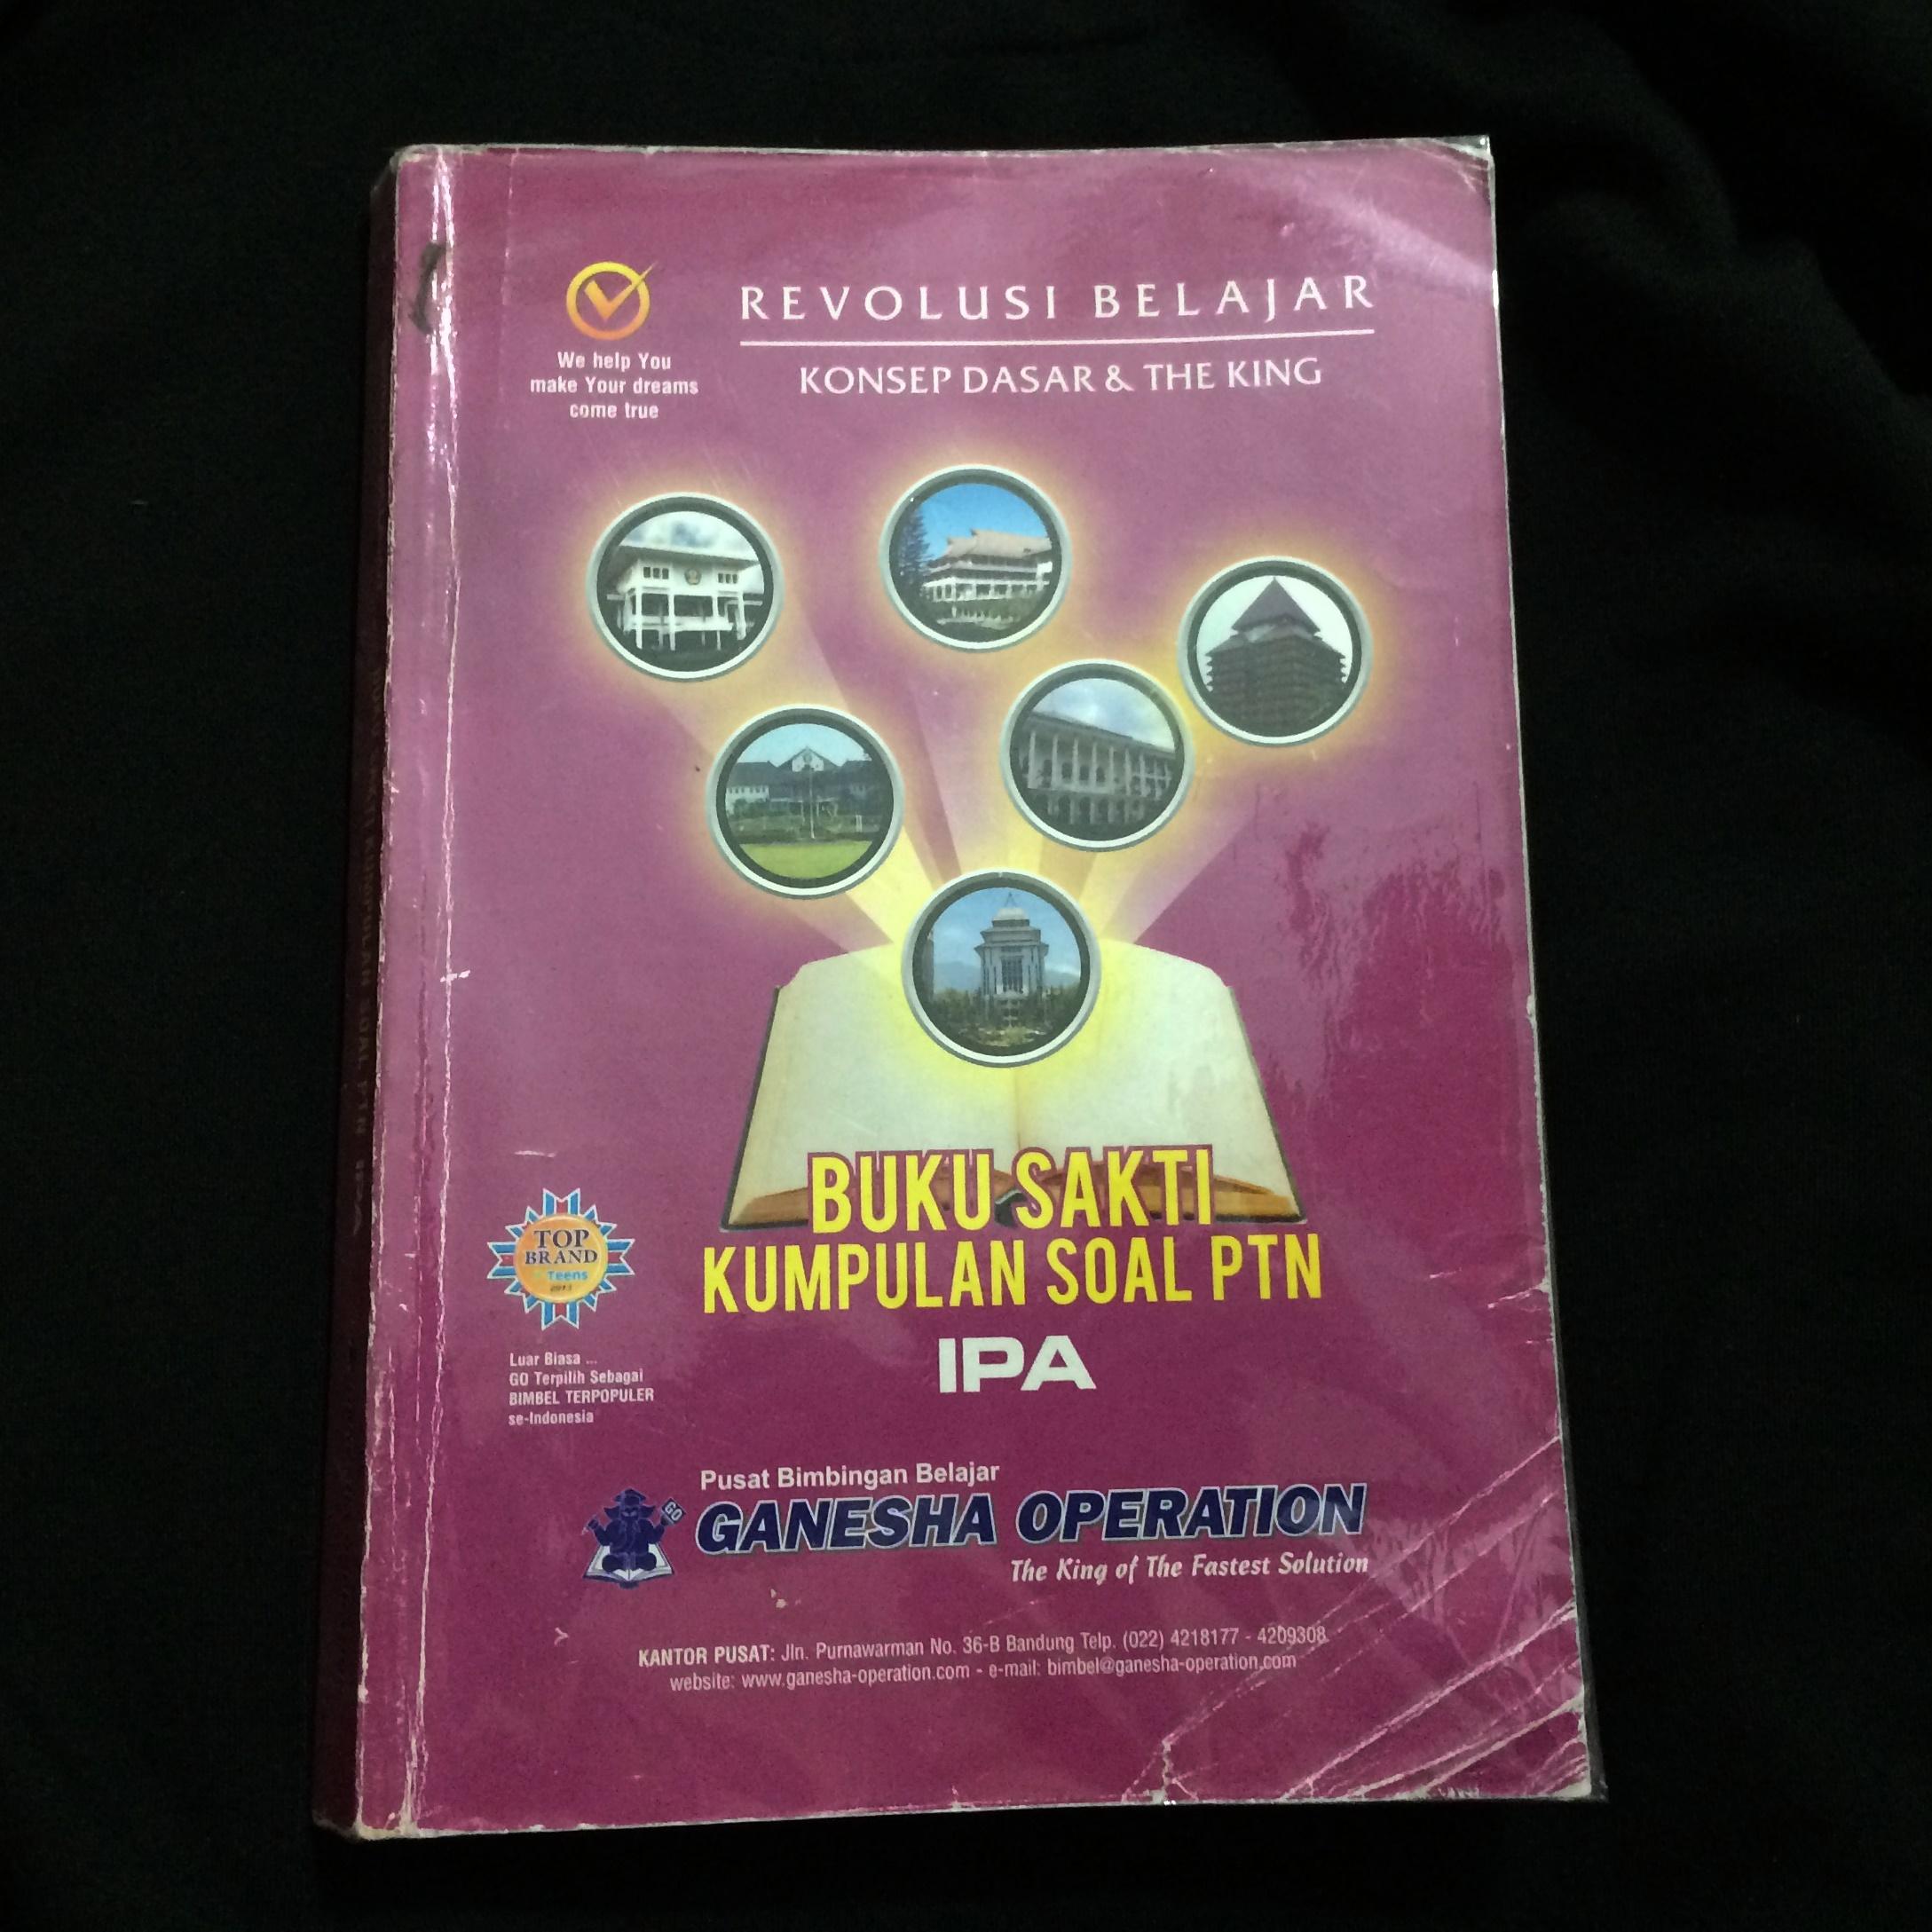 Buku Sakti Kumpulan Soal Ptn Ipa Ganesha Operation Kunci Jawaban Buku Alat Tulis Buku Di Carousell